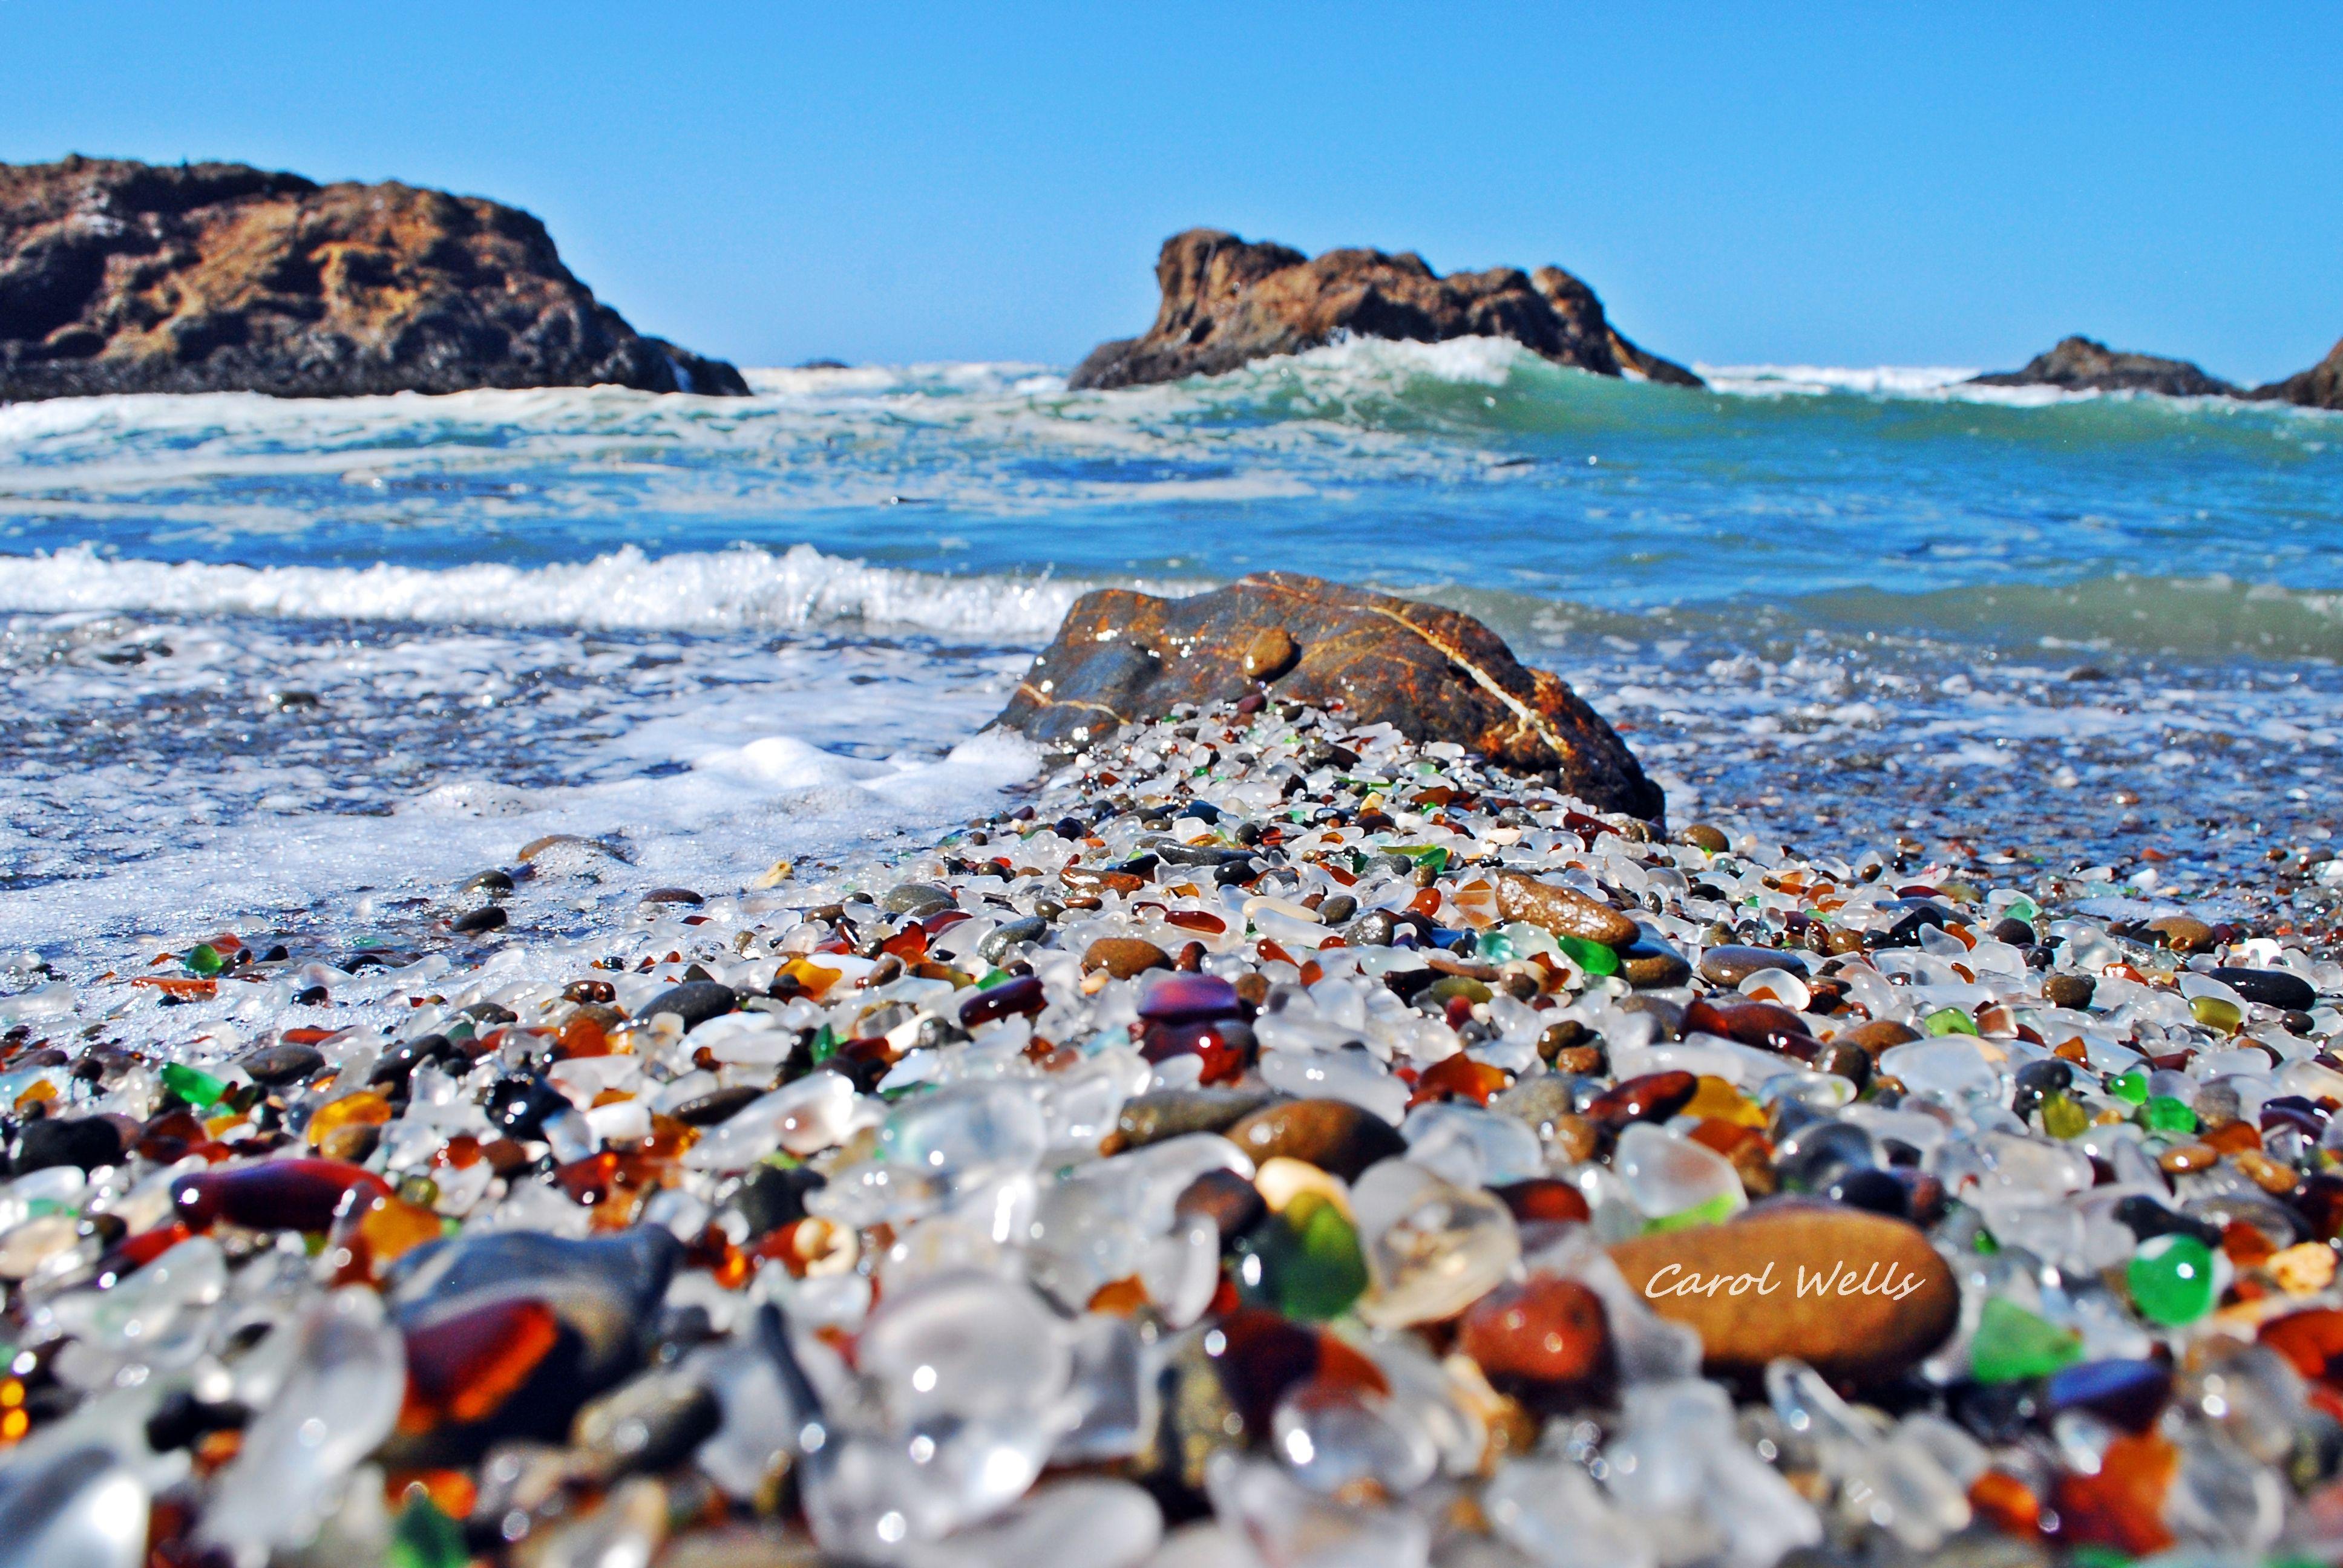 This Is A Beach In California Glass Beach In Ft Bragg